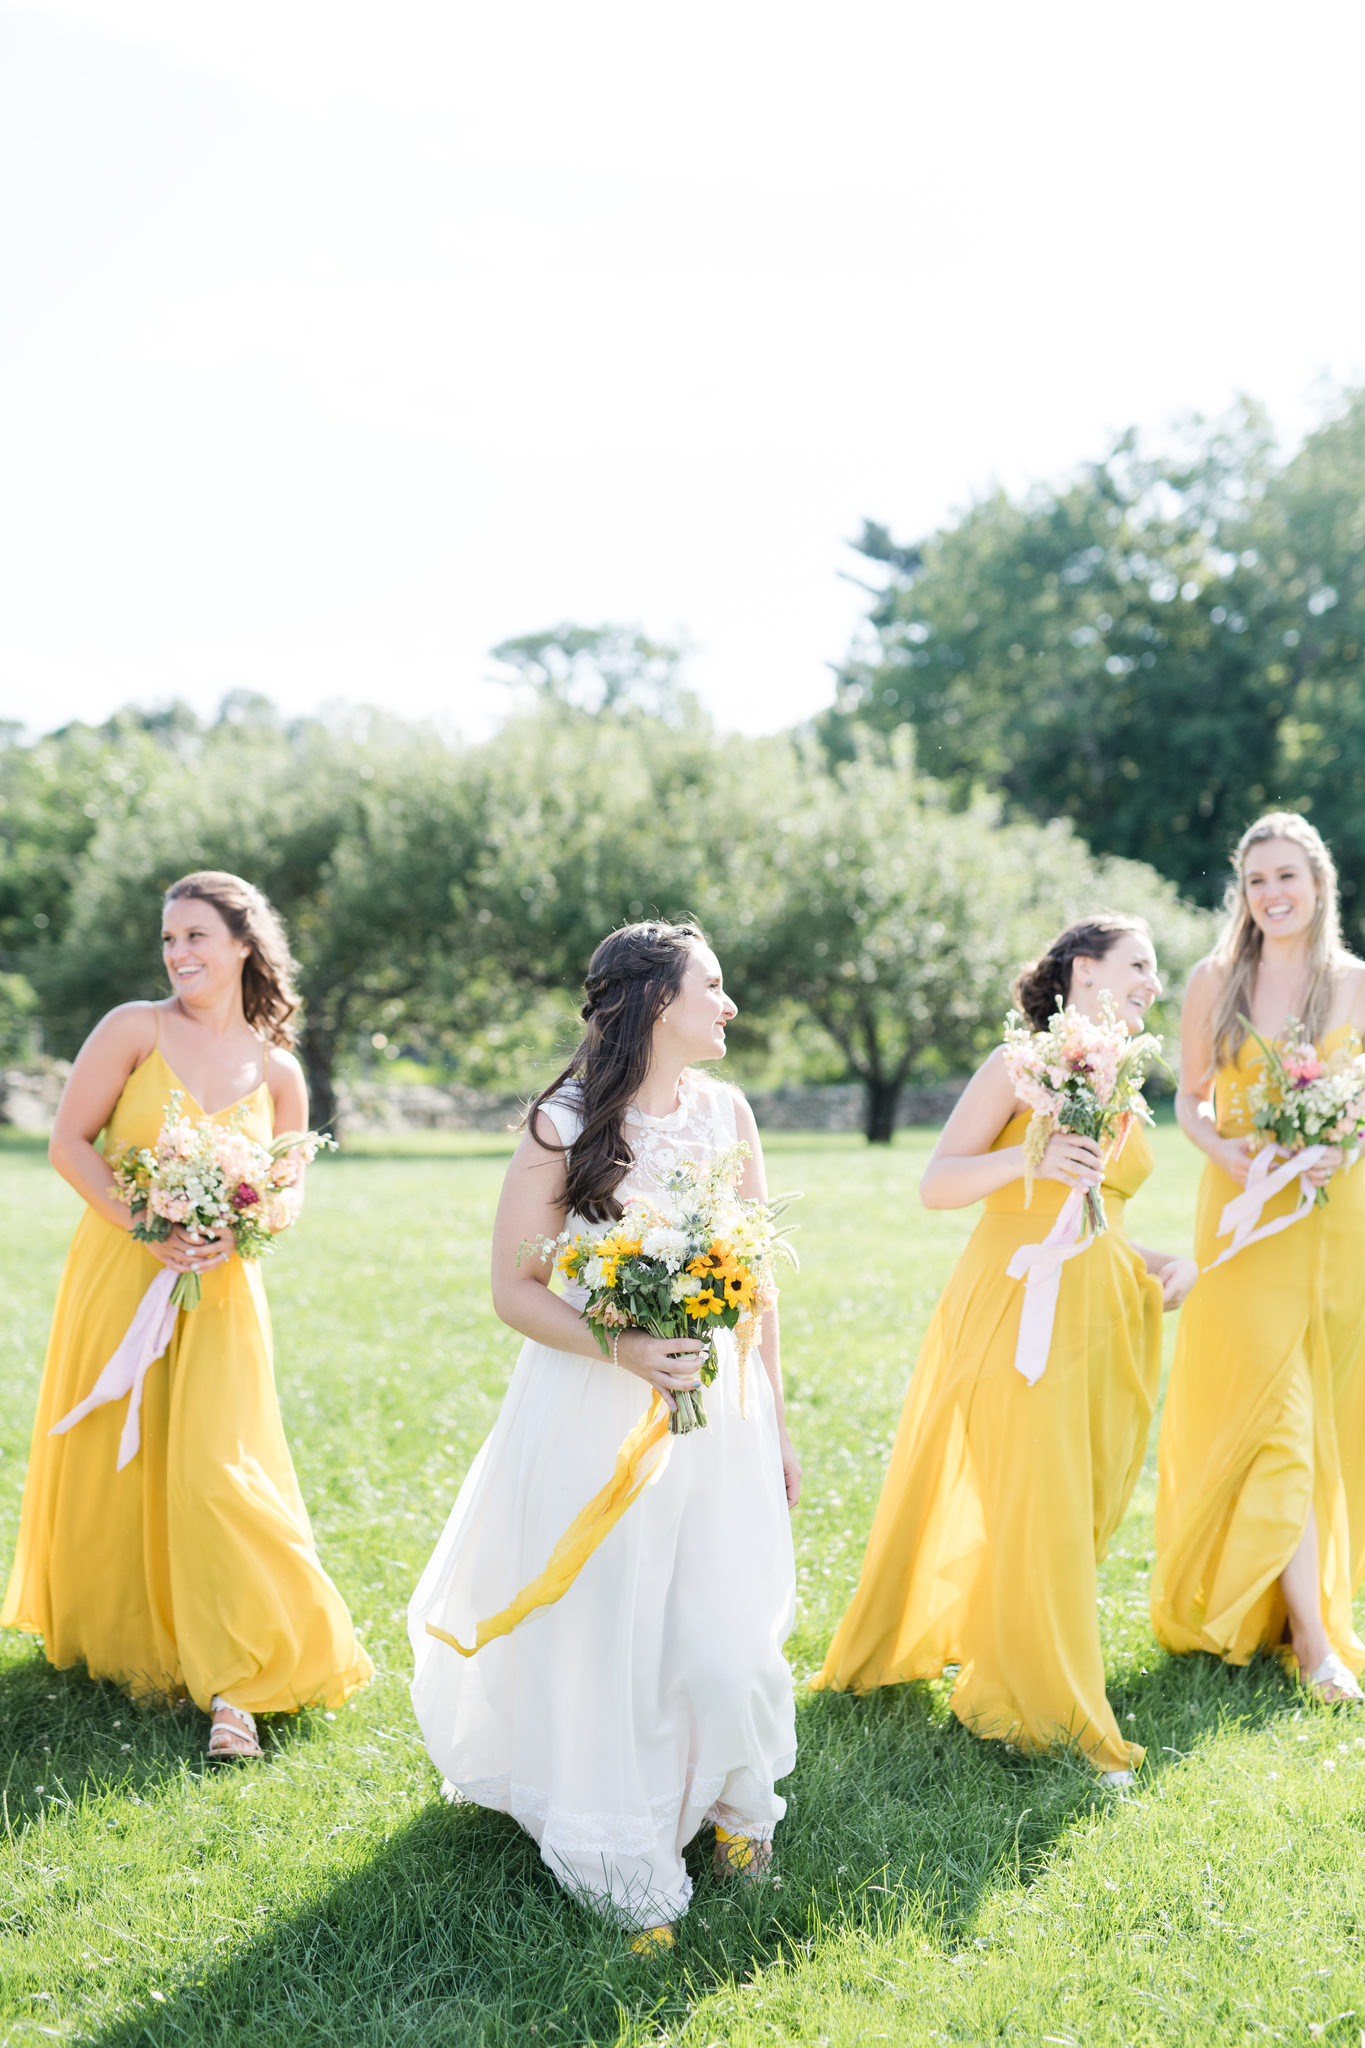 hickories wedding_jenny yoo bridesmaid dresses_photo__ct wedding_ct wedding photographer-3.jpg